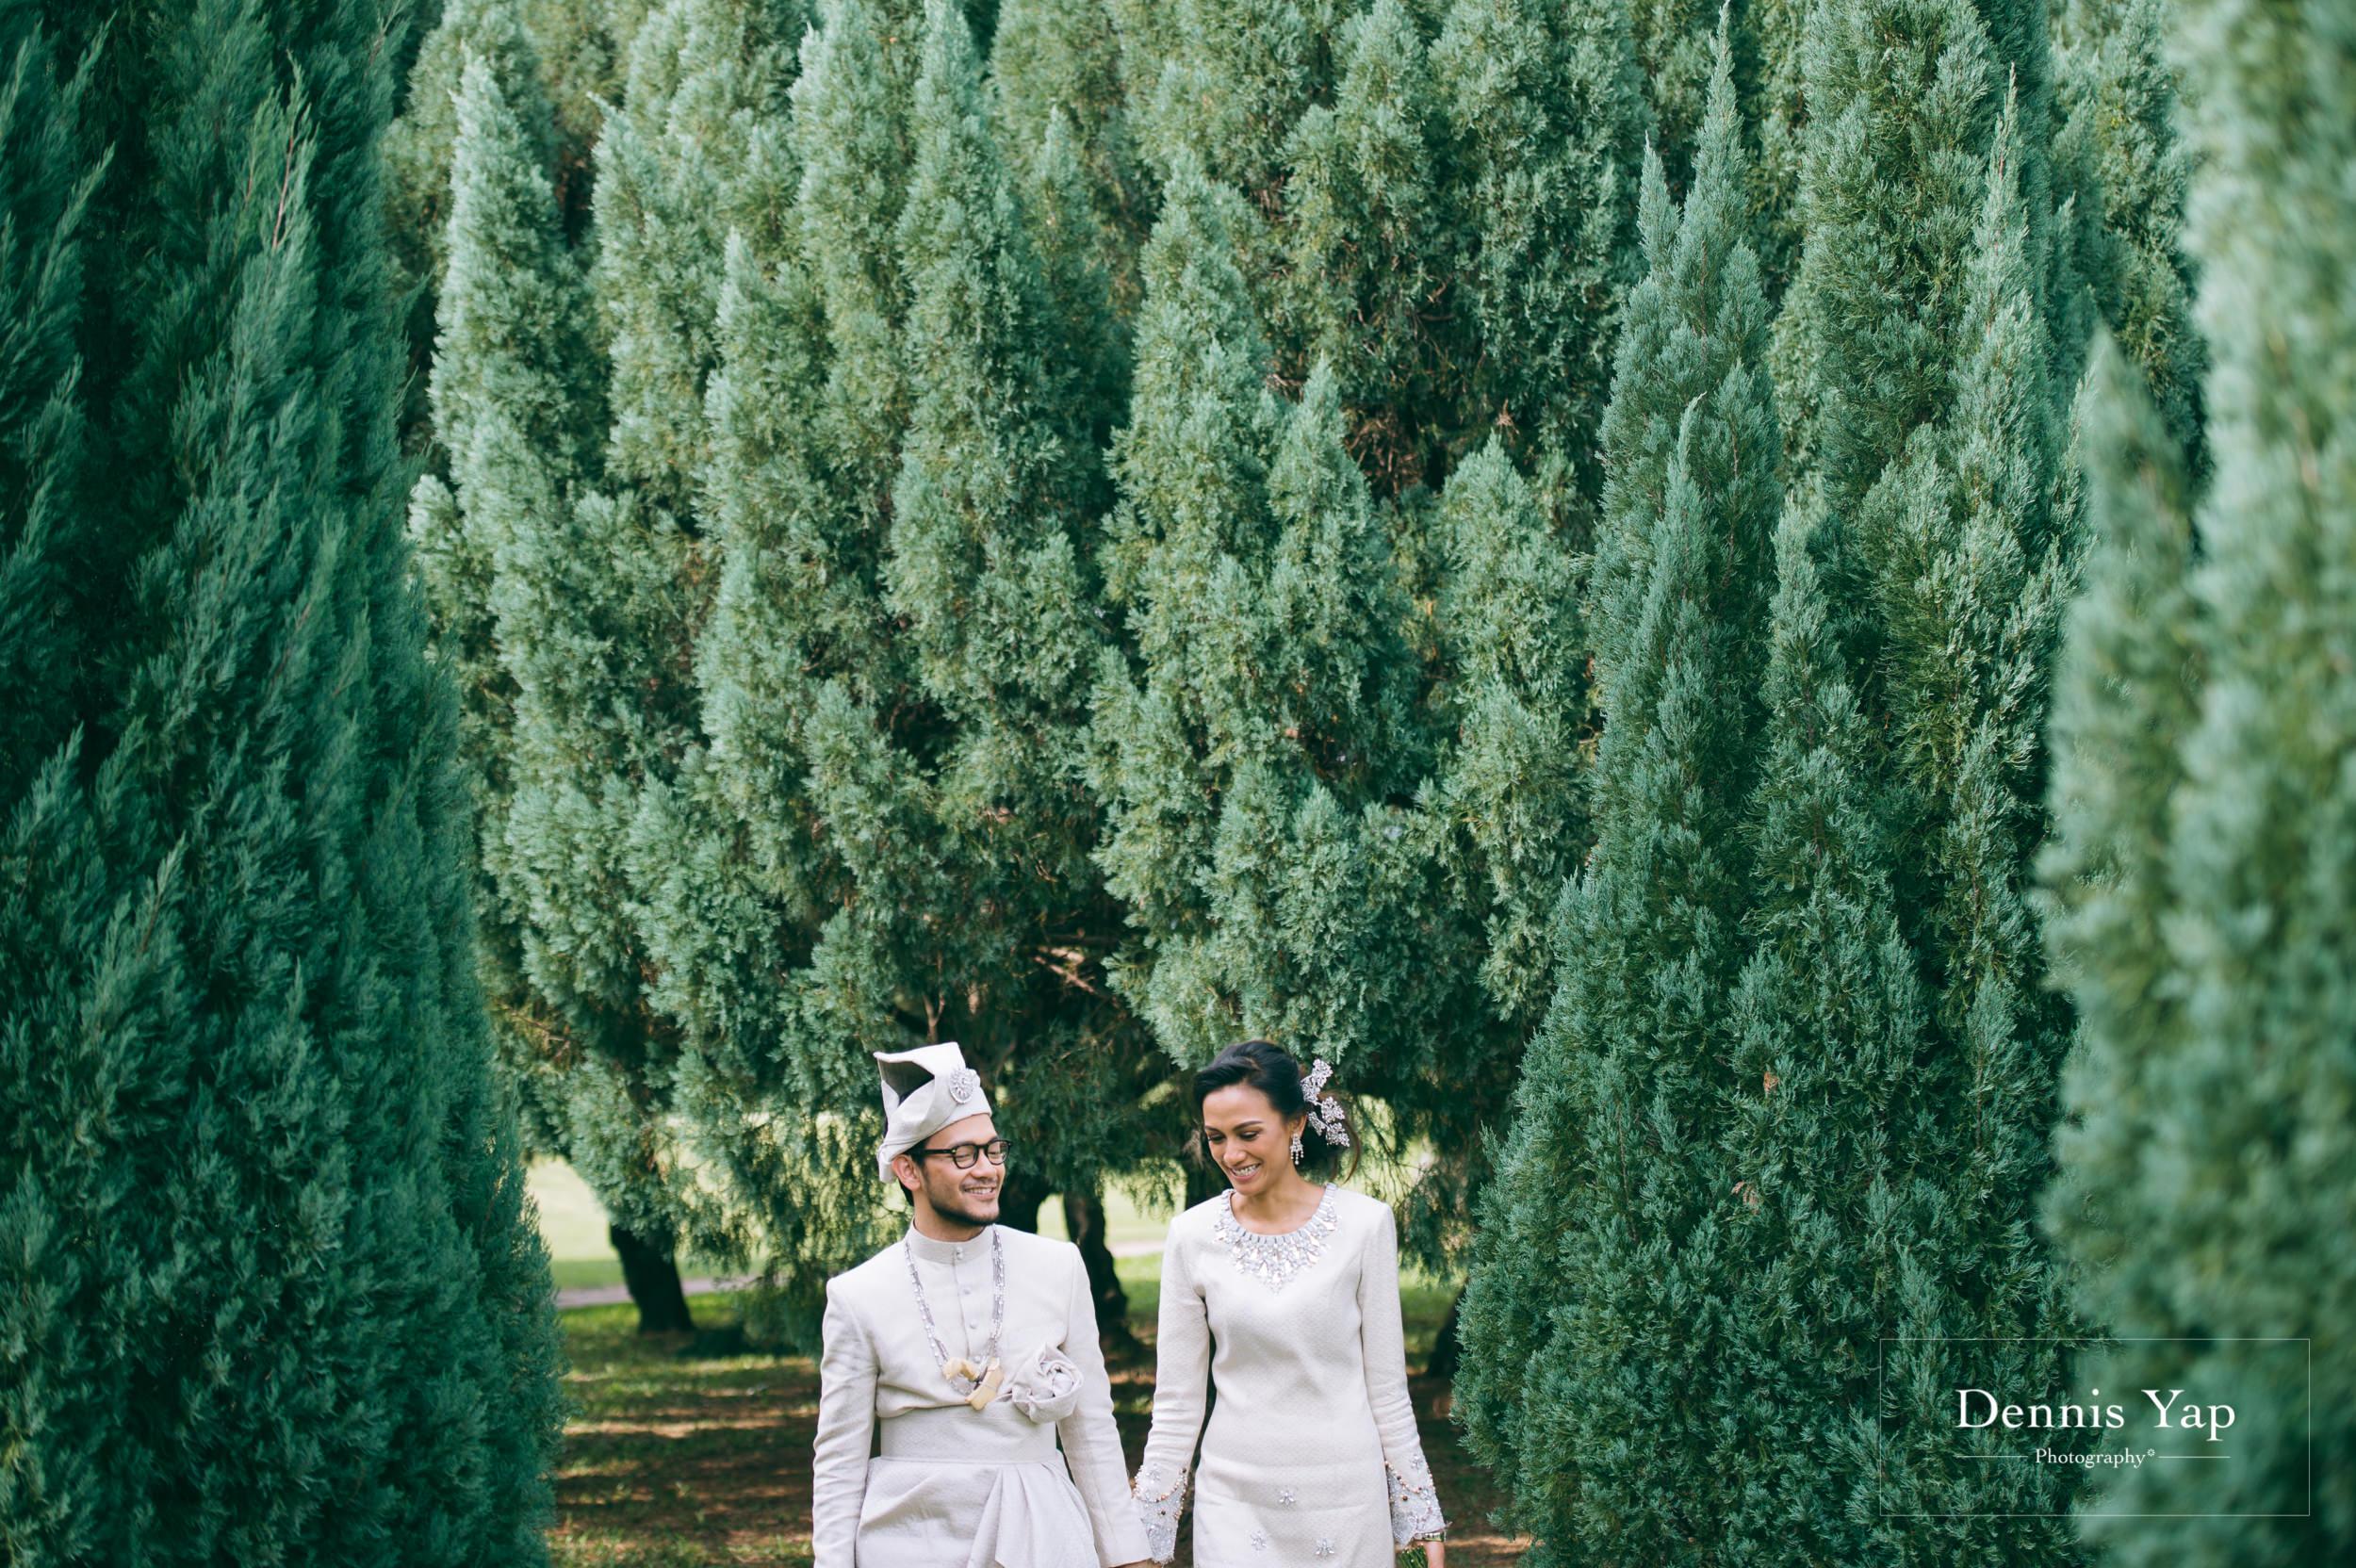 zarif hanalili malay wedding blessing ceremony dennis yap photography-25.jpg